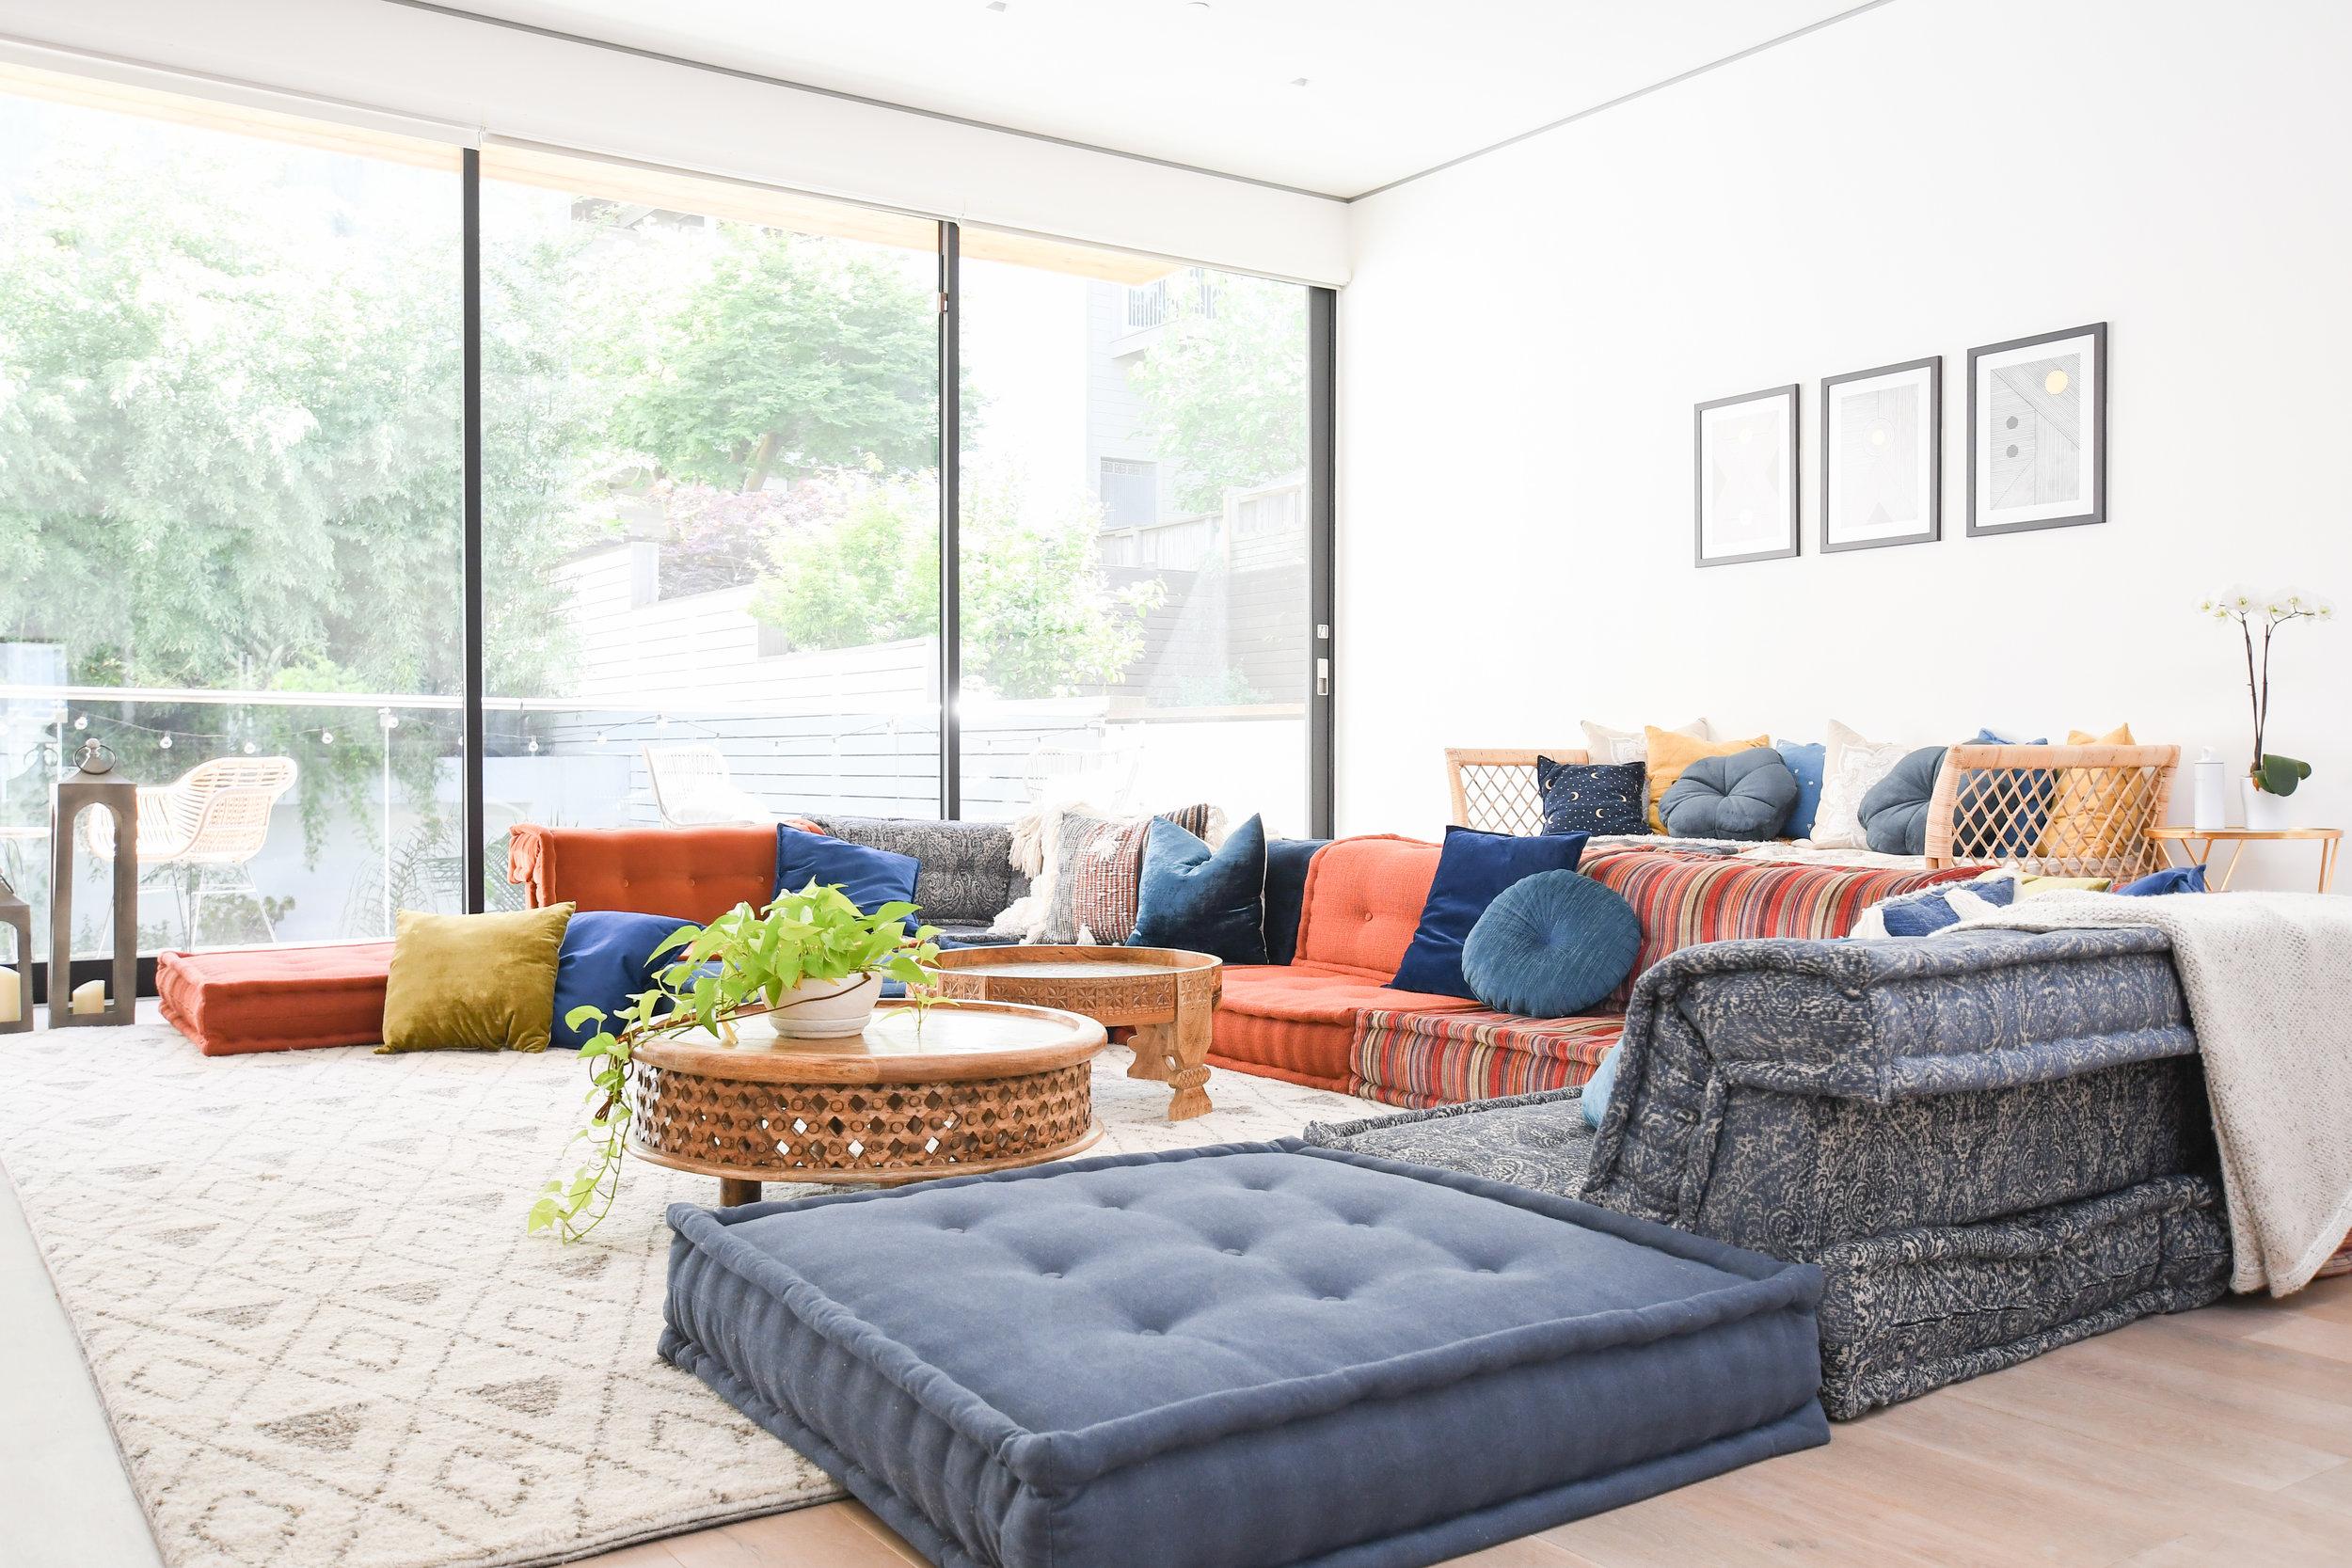 Angela Grace Design - Laguna Family Room - San Francisco and SF Bay Area Interior Designer, Decorator